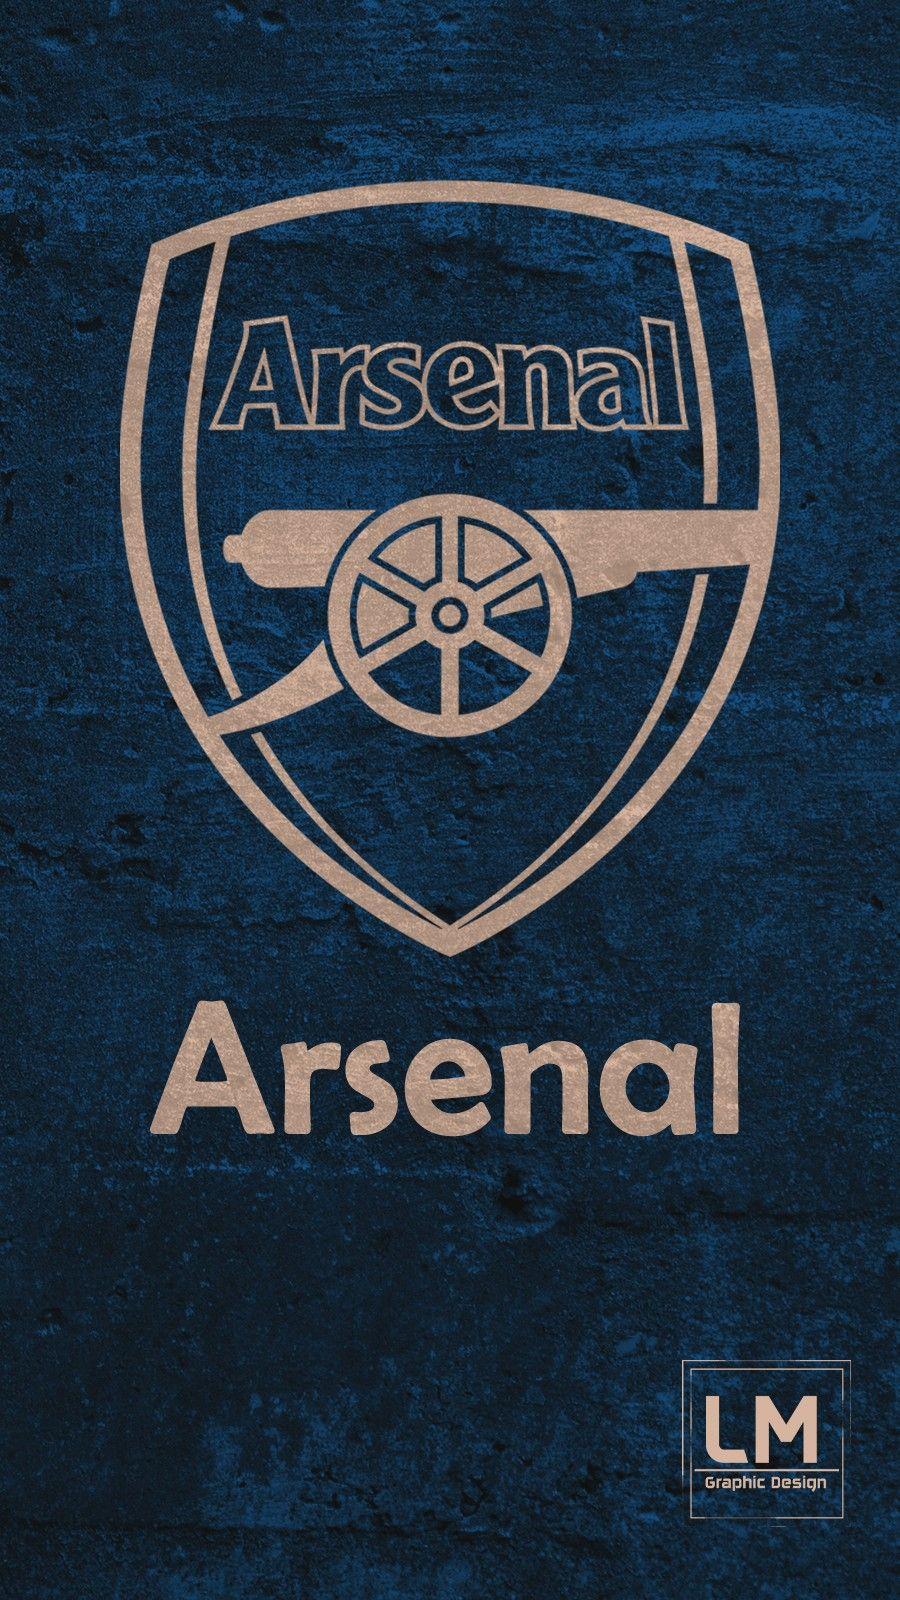 Arsenal Wallpaper 3 Sepak Bola Olahraga Fotografi